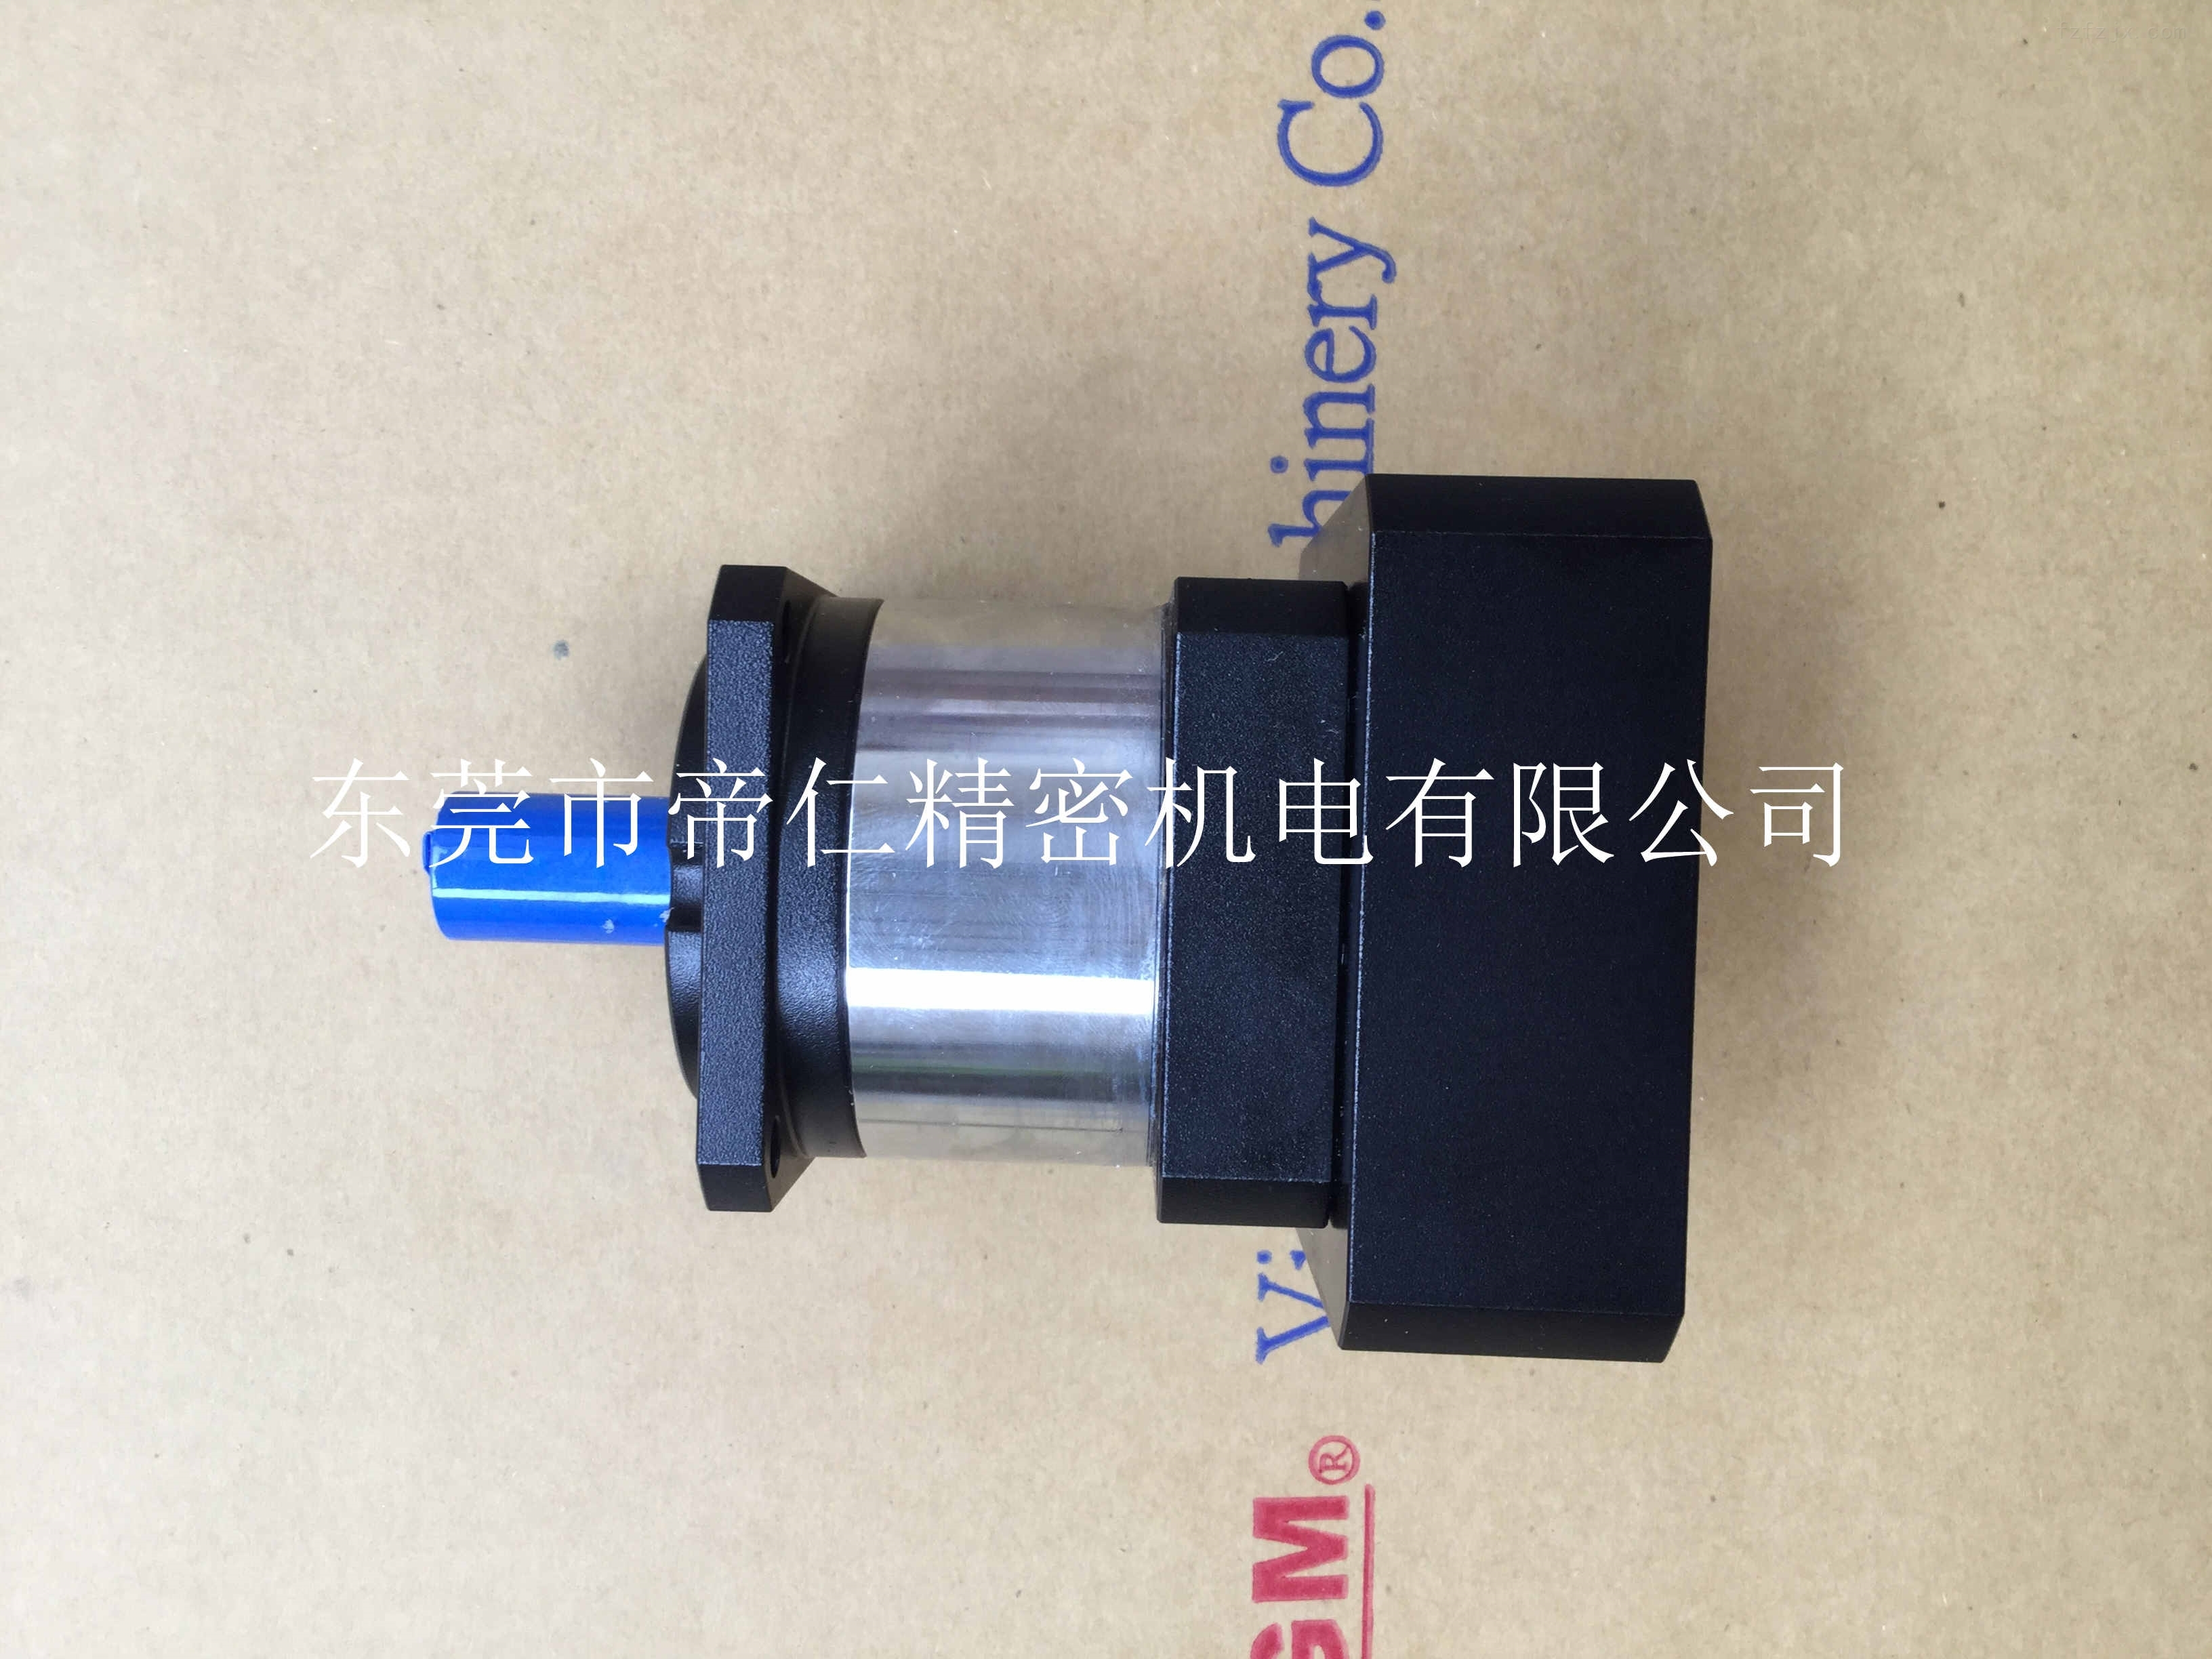 HD�p速�CSG60FL2-50-8-47-70-D12伺服�p速器